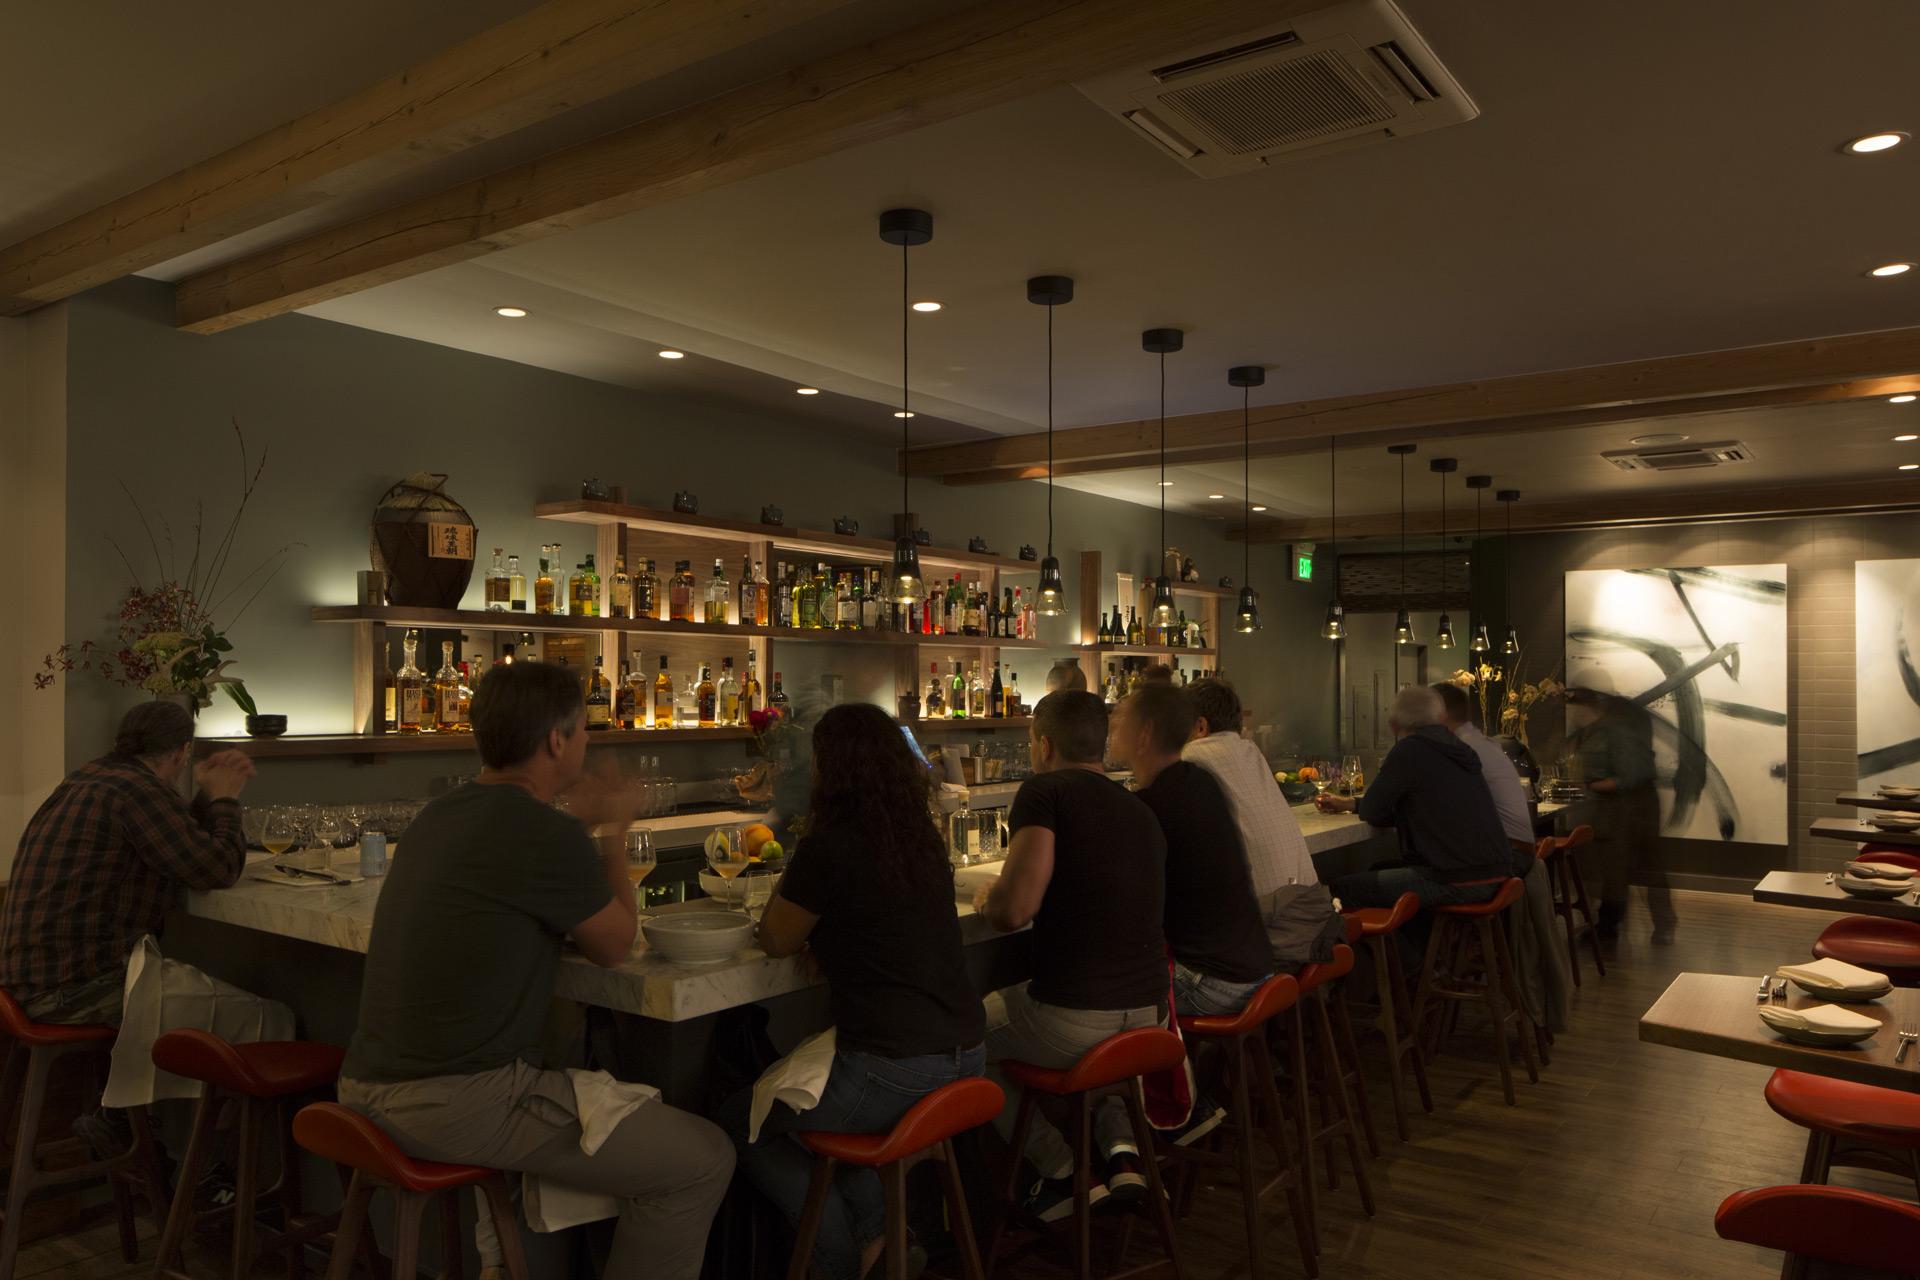 Nomica restaurant decor